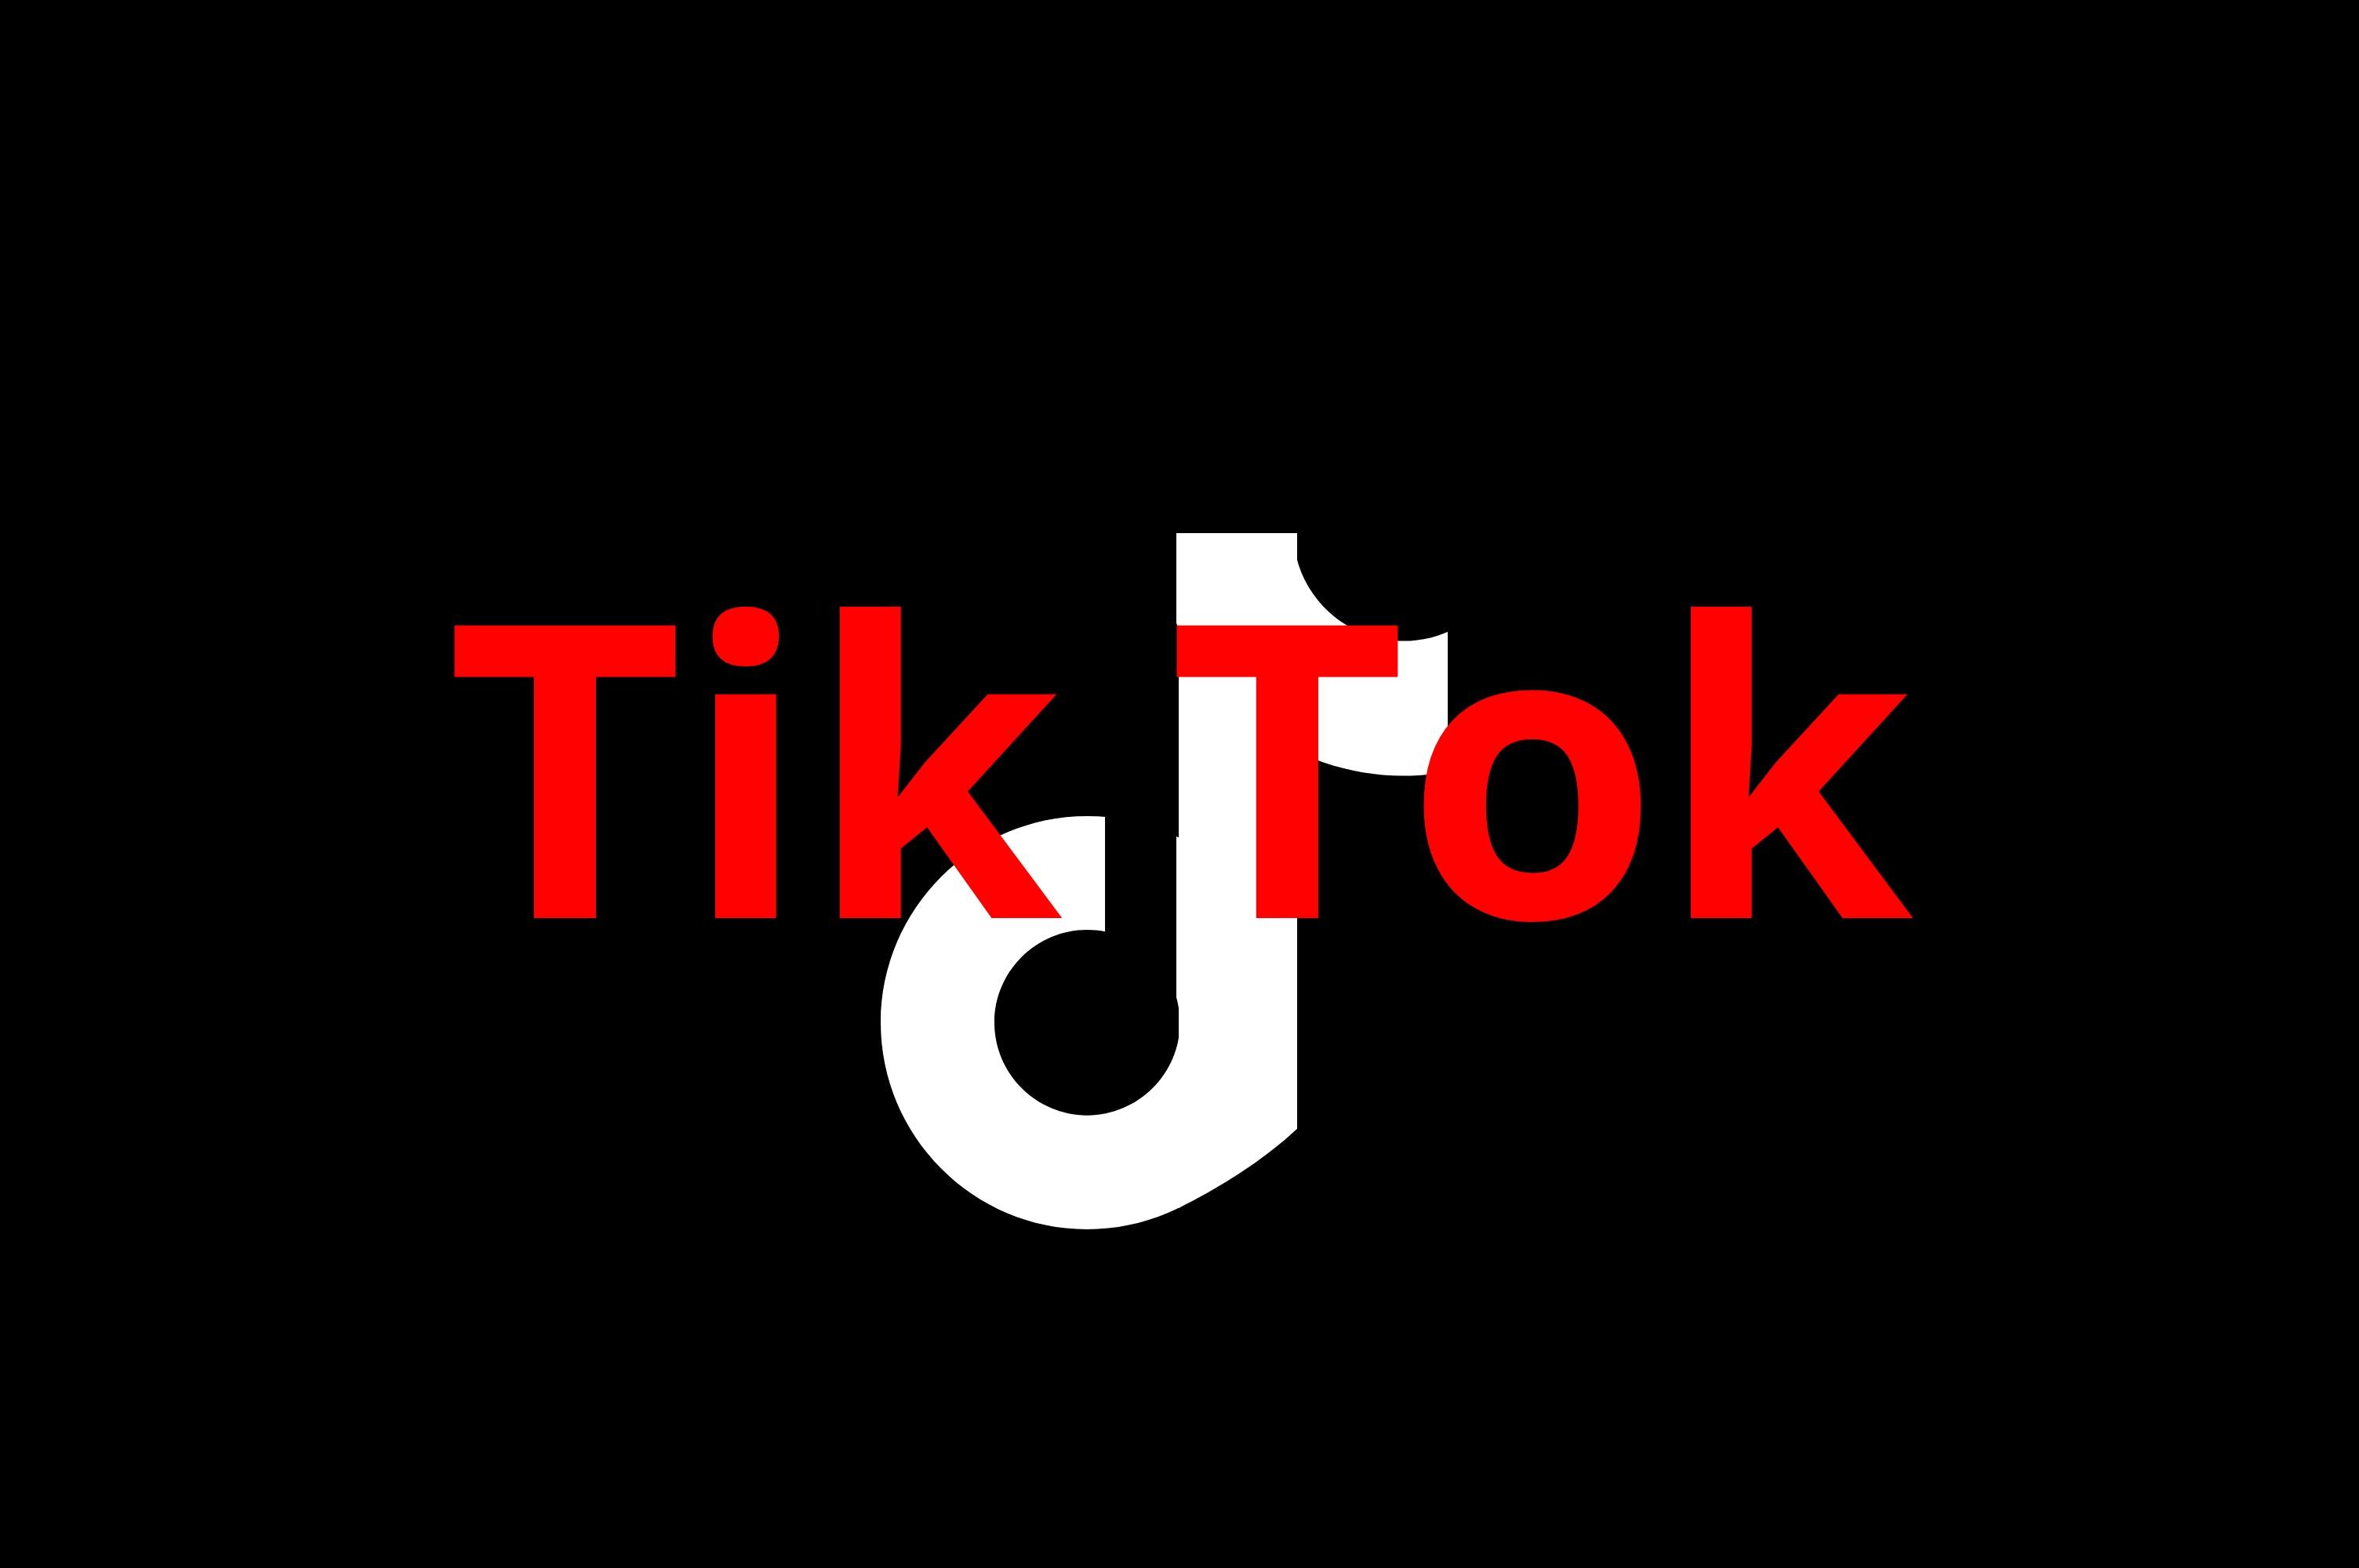 How Tik Tok Affecting Young Generation Negatively Tiktok Impact